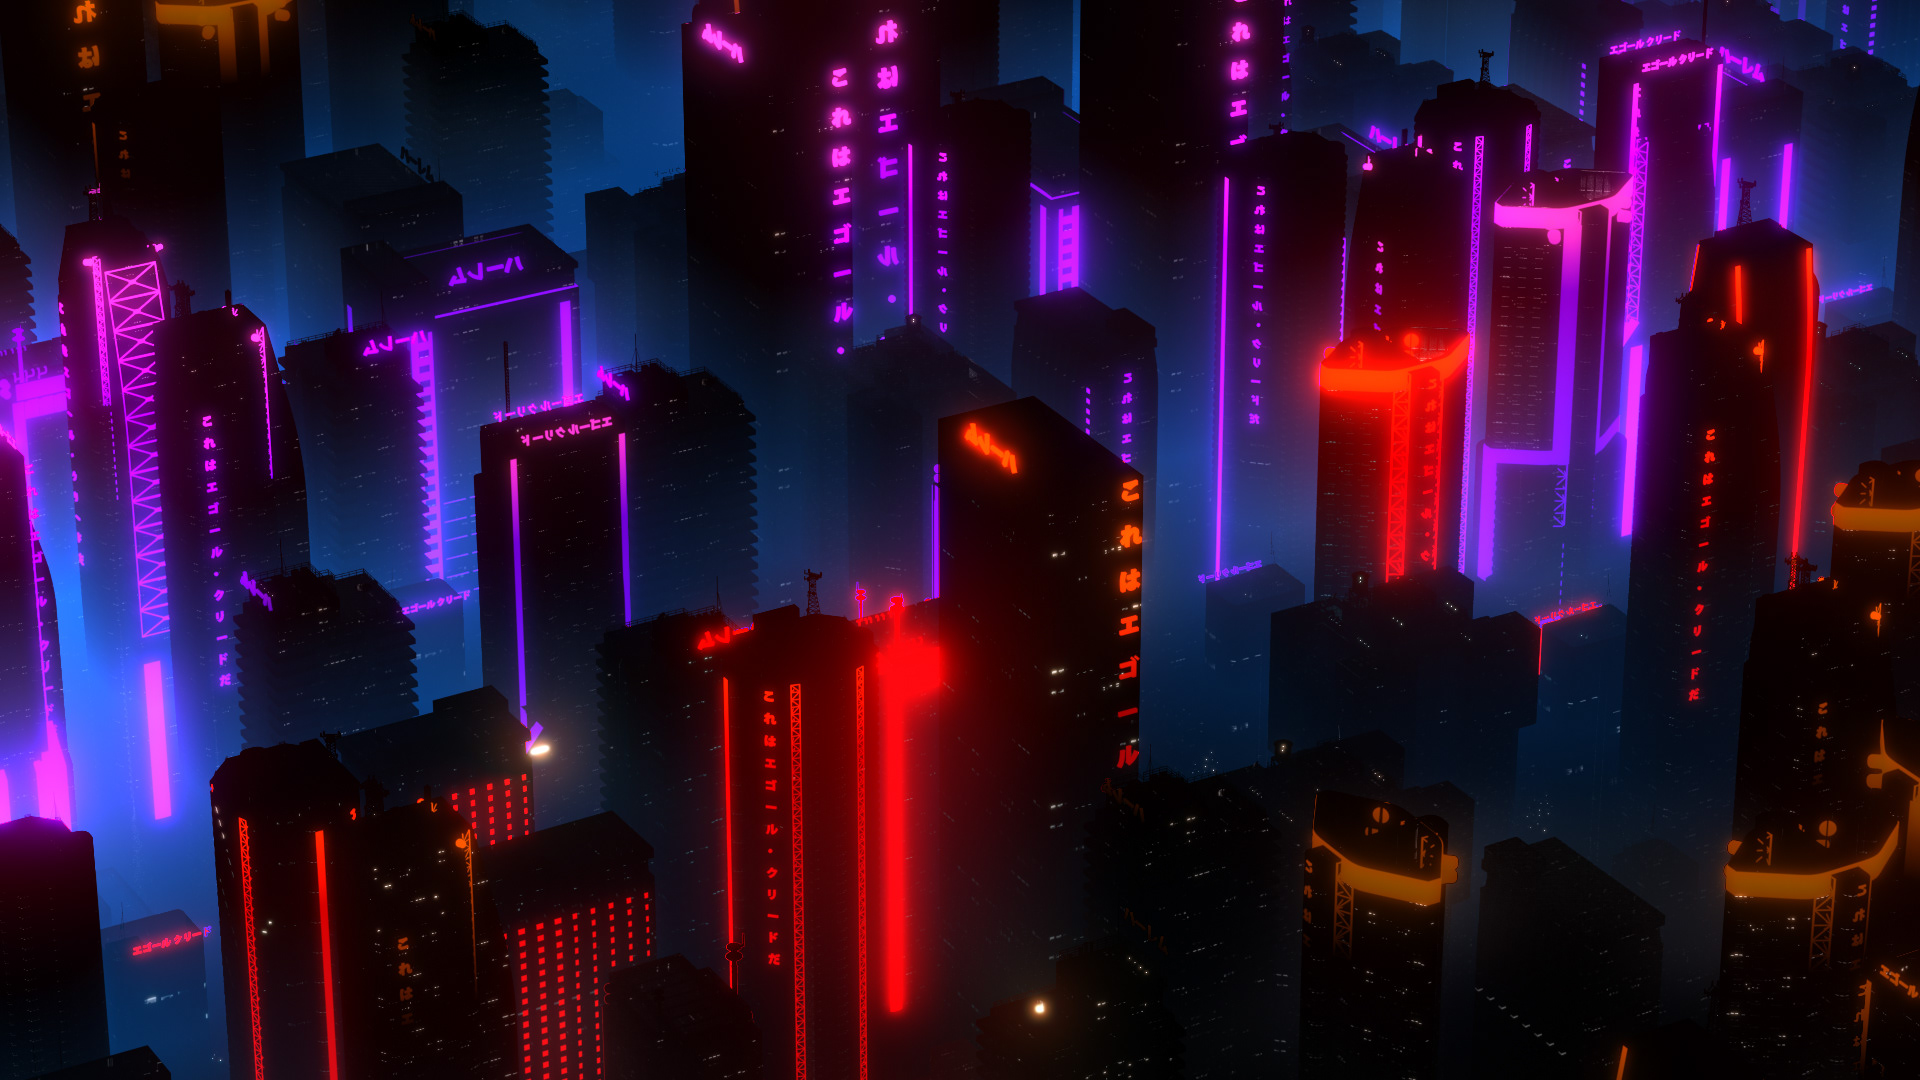 CITY NIGHT COOL WALLPAPER HD 1080